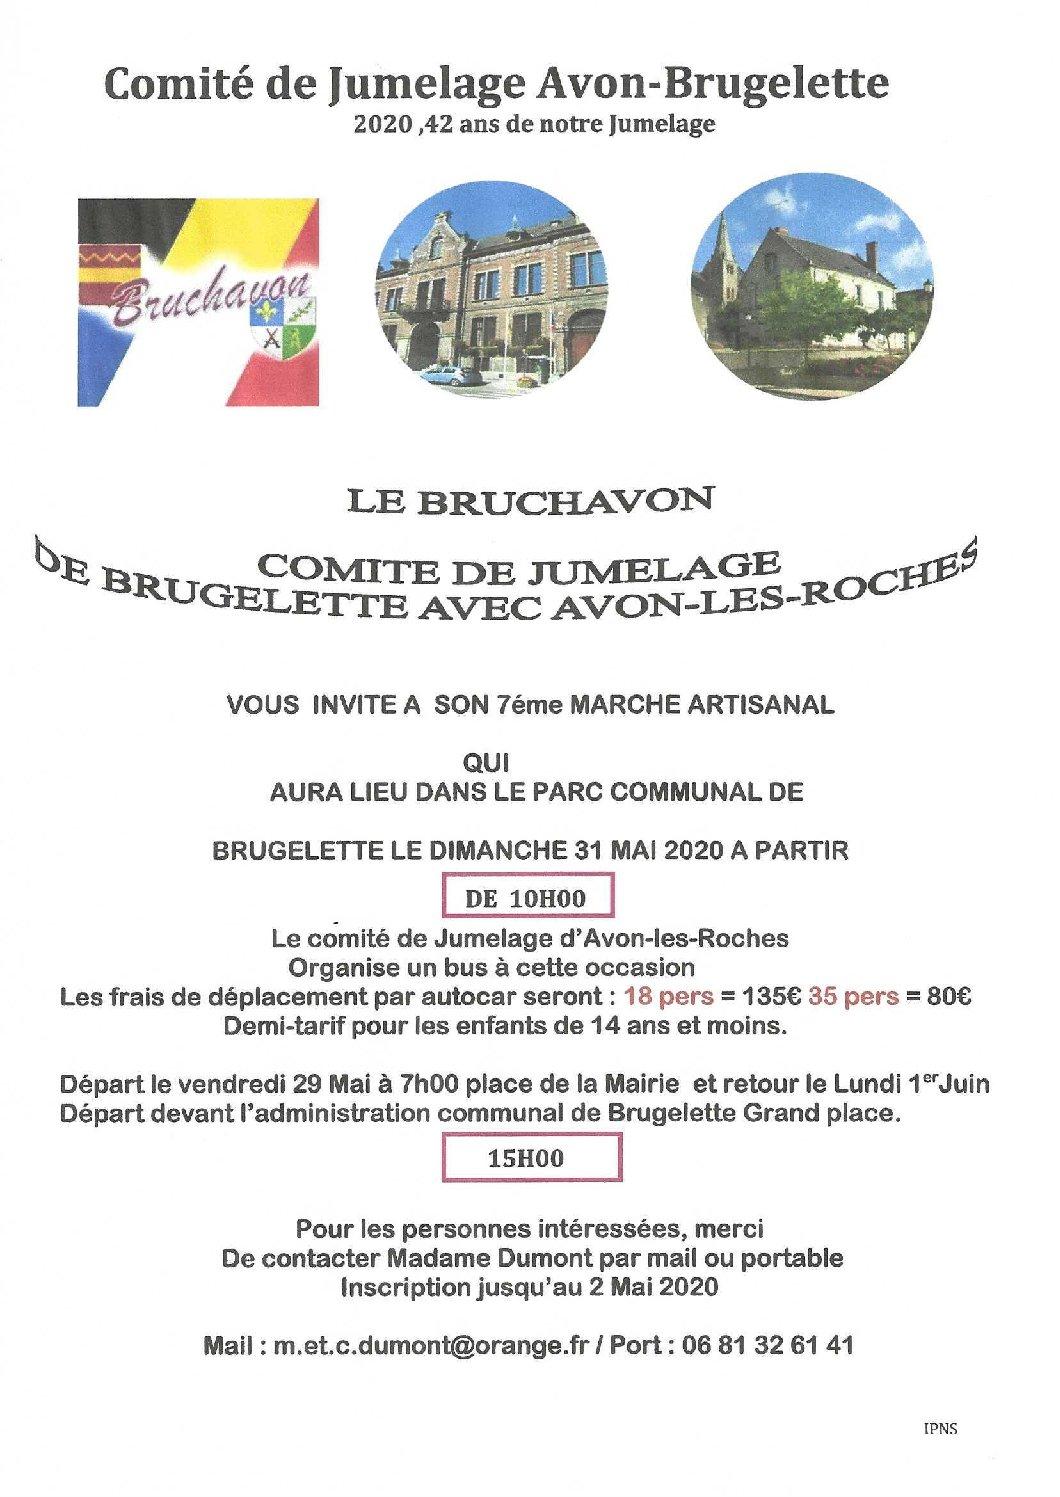 Jumelage Avon-Brugelette